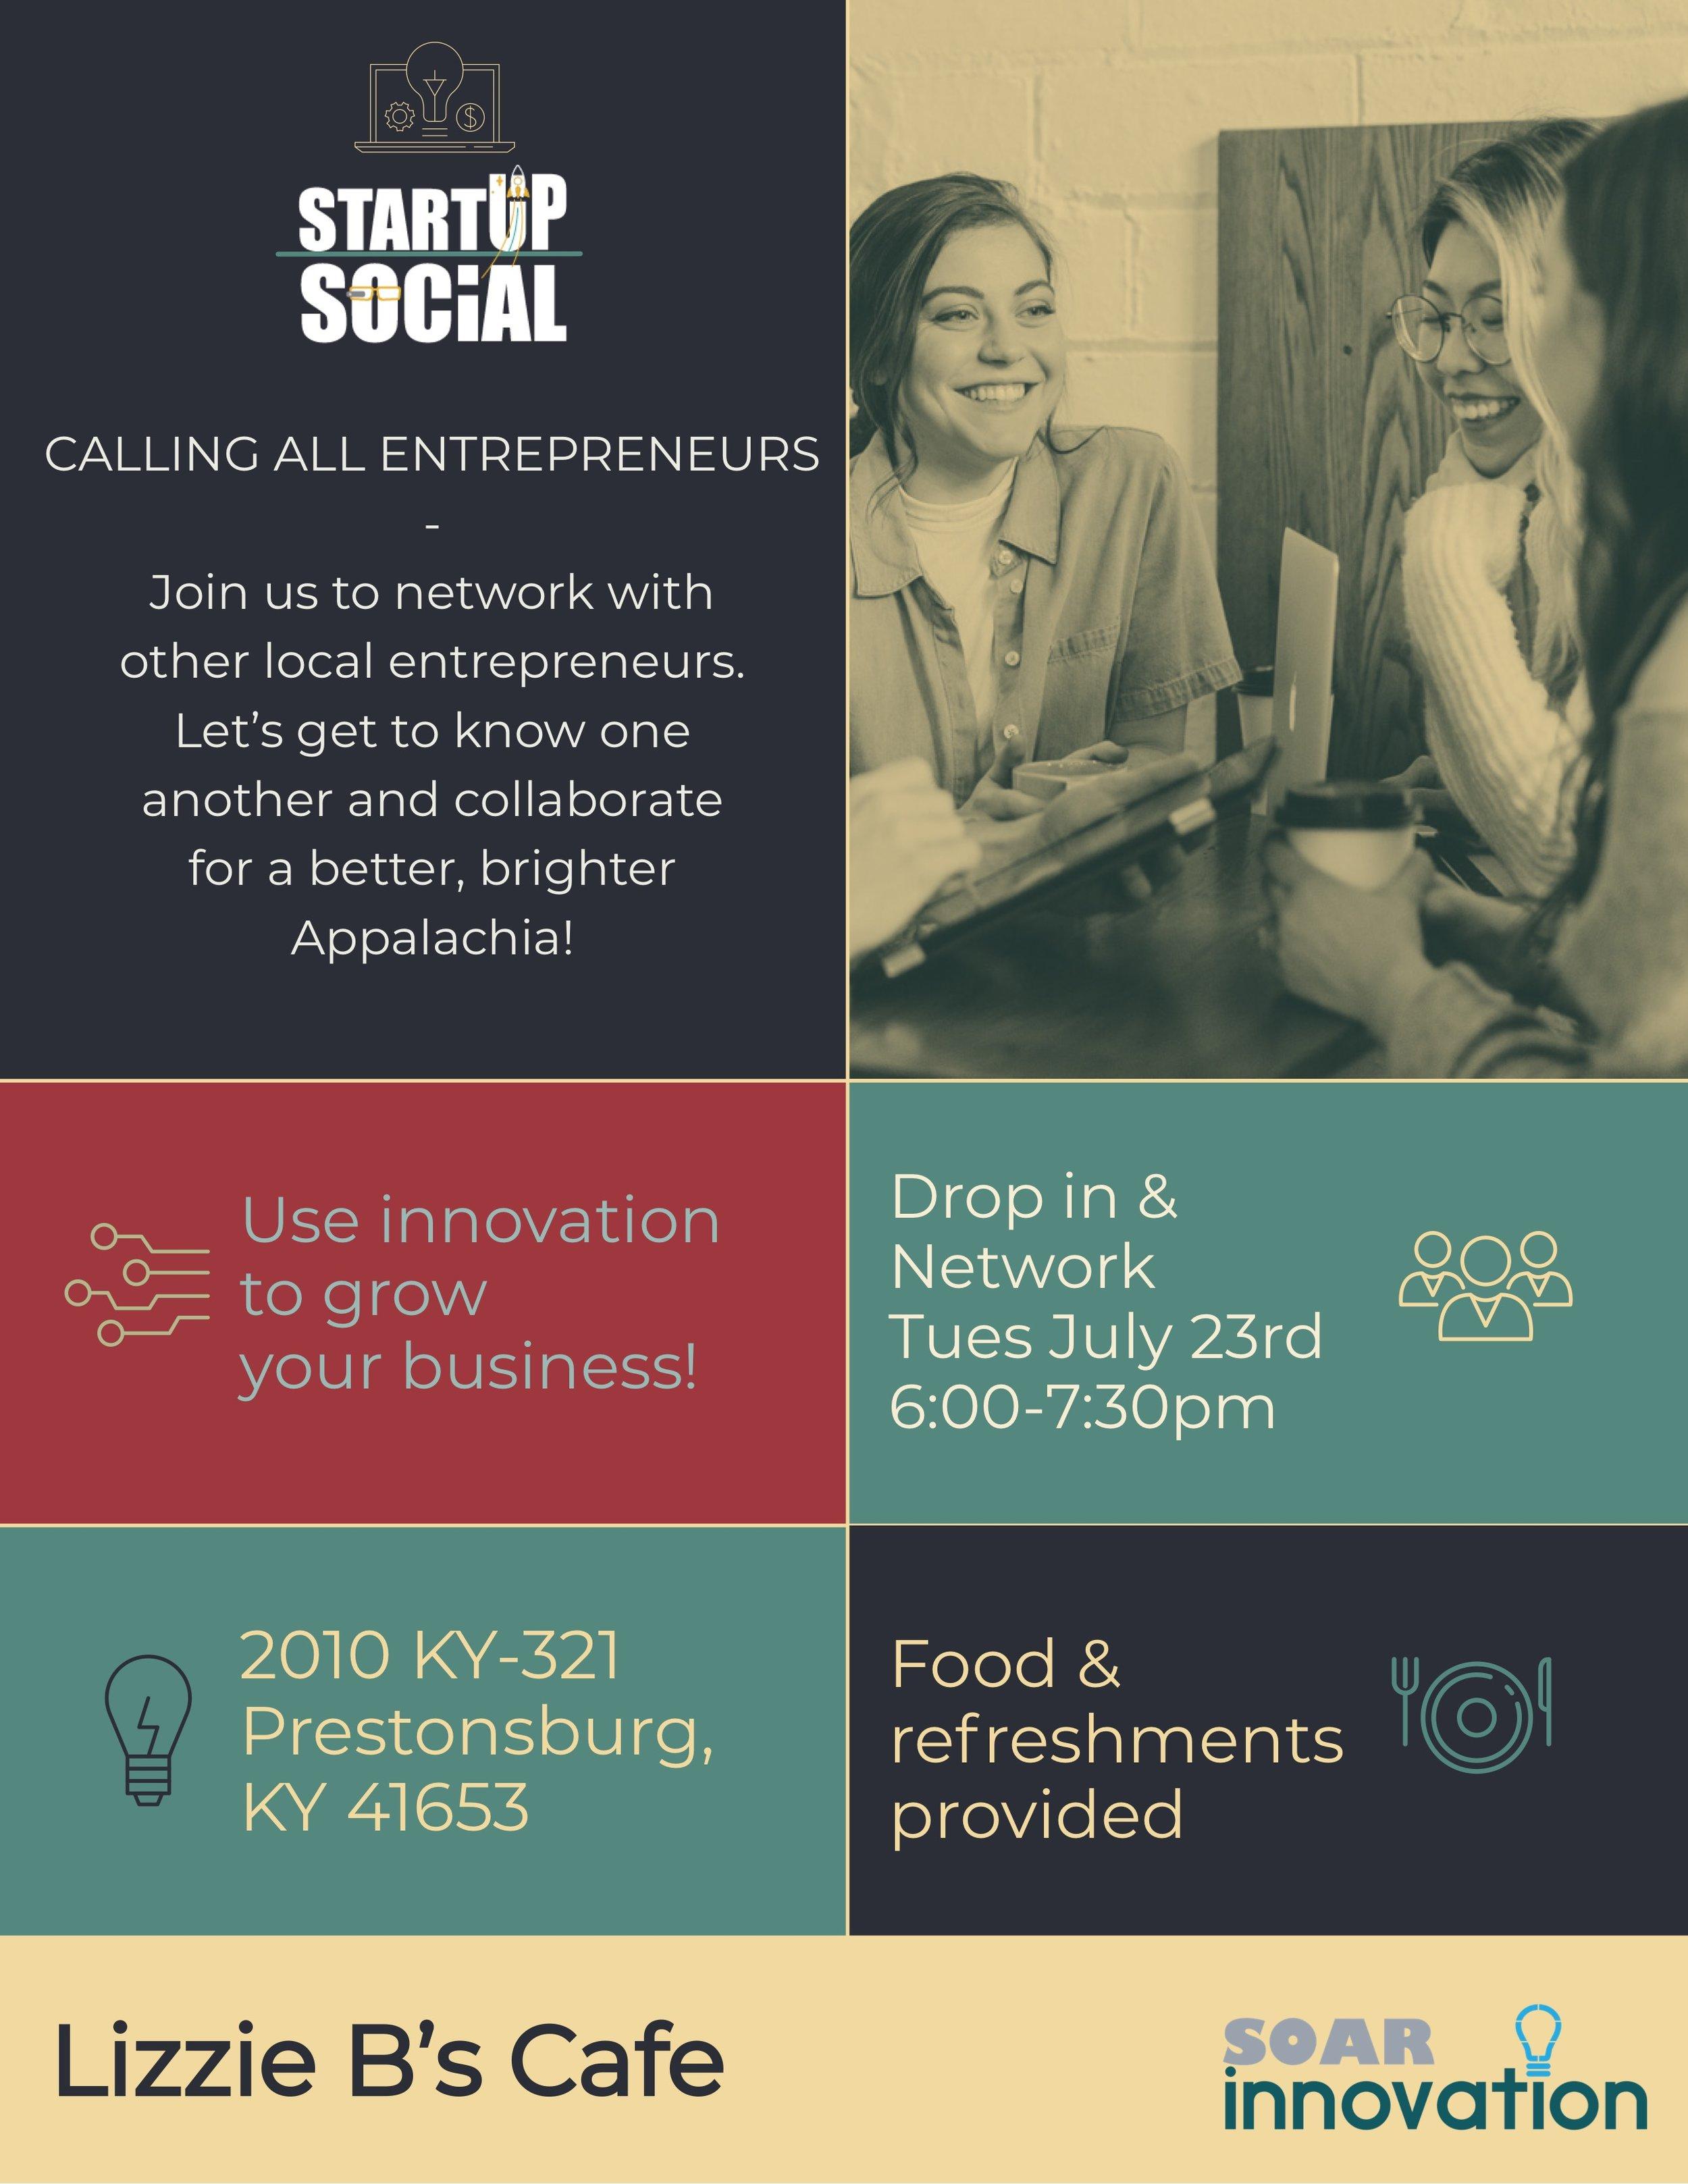 start-up social prestonsburg flyer.png